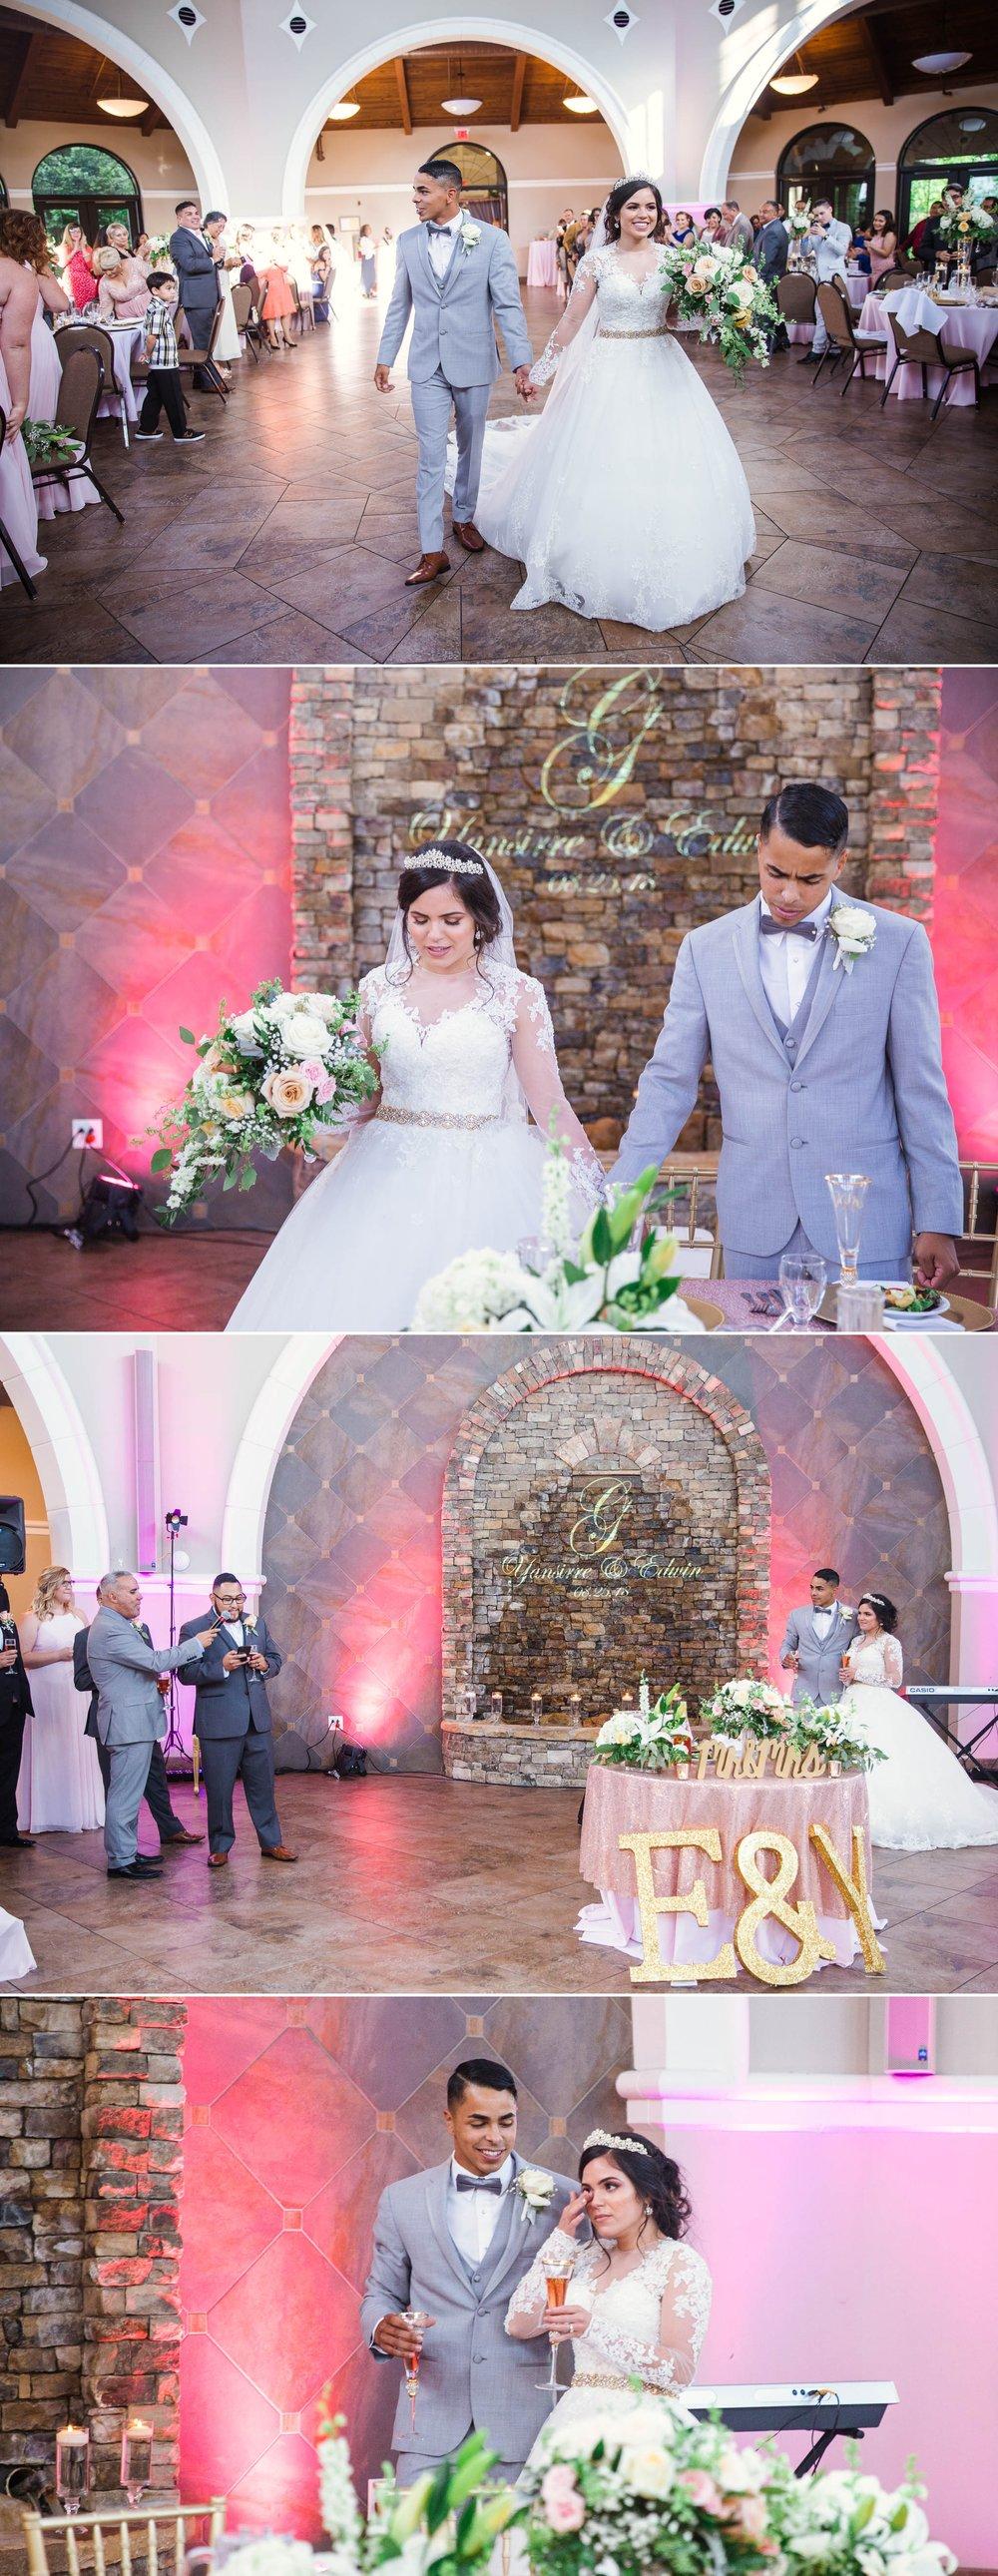 Bride and groom walking in, speaches and praying - Yansi + Eddie - Wedding at Cape Fear Botanical Garden - Fayetteville North Carolina Photographer